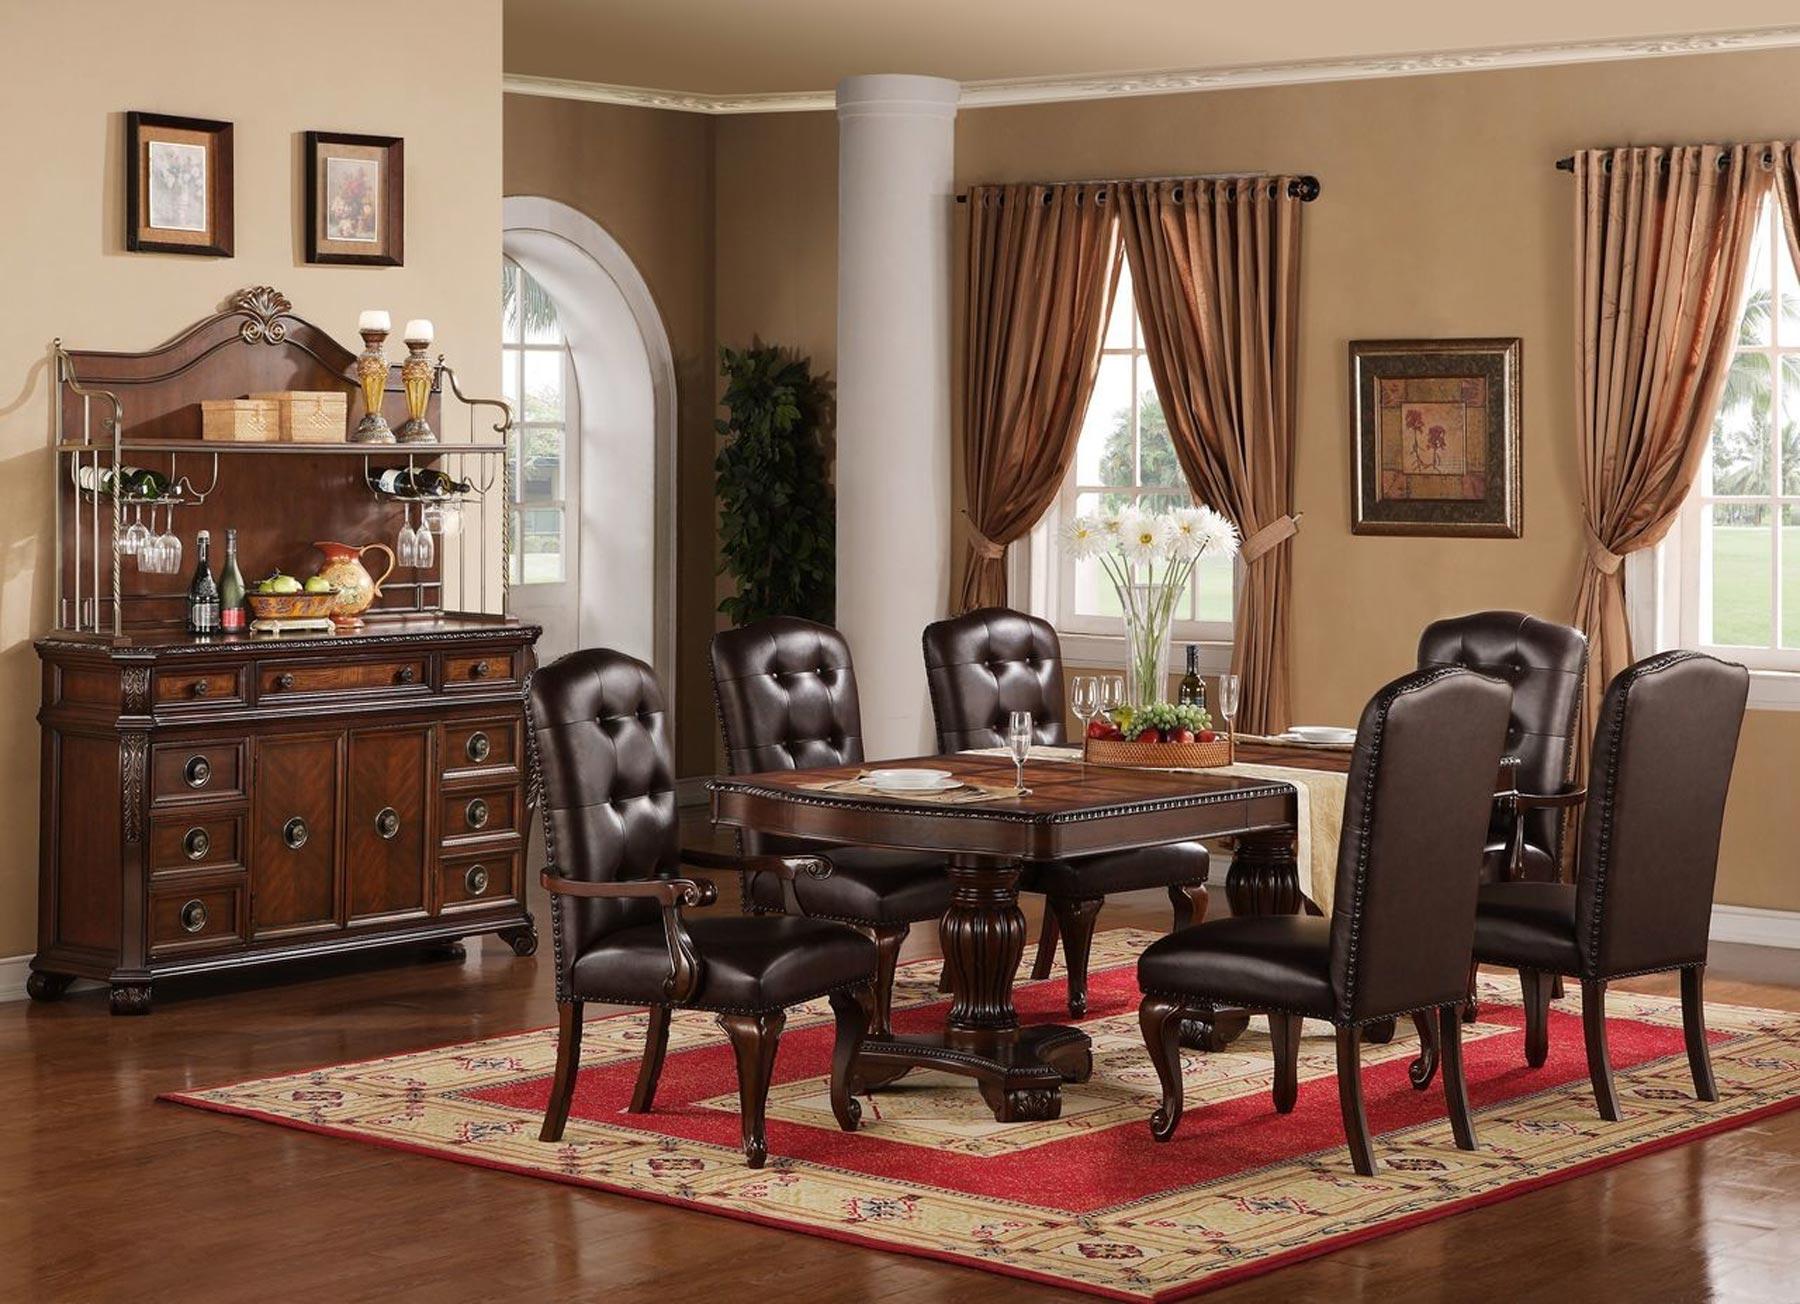 Hemingway 7 Piece Dining Room Set & Hemingway 7 Piece Dining Room Set | Gonzalez Furniture